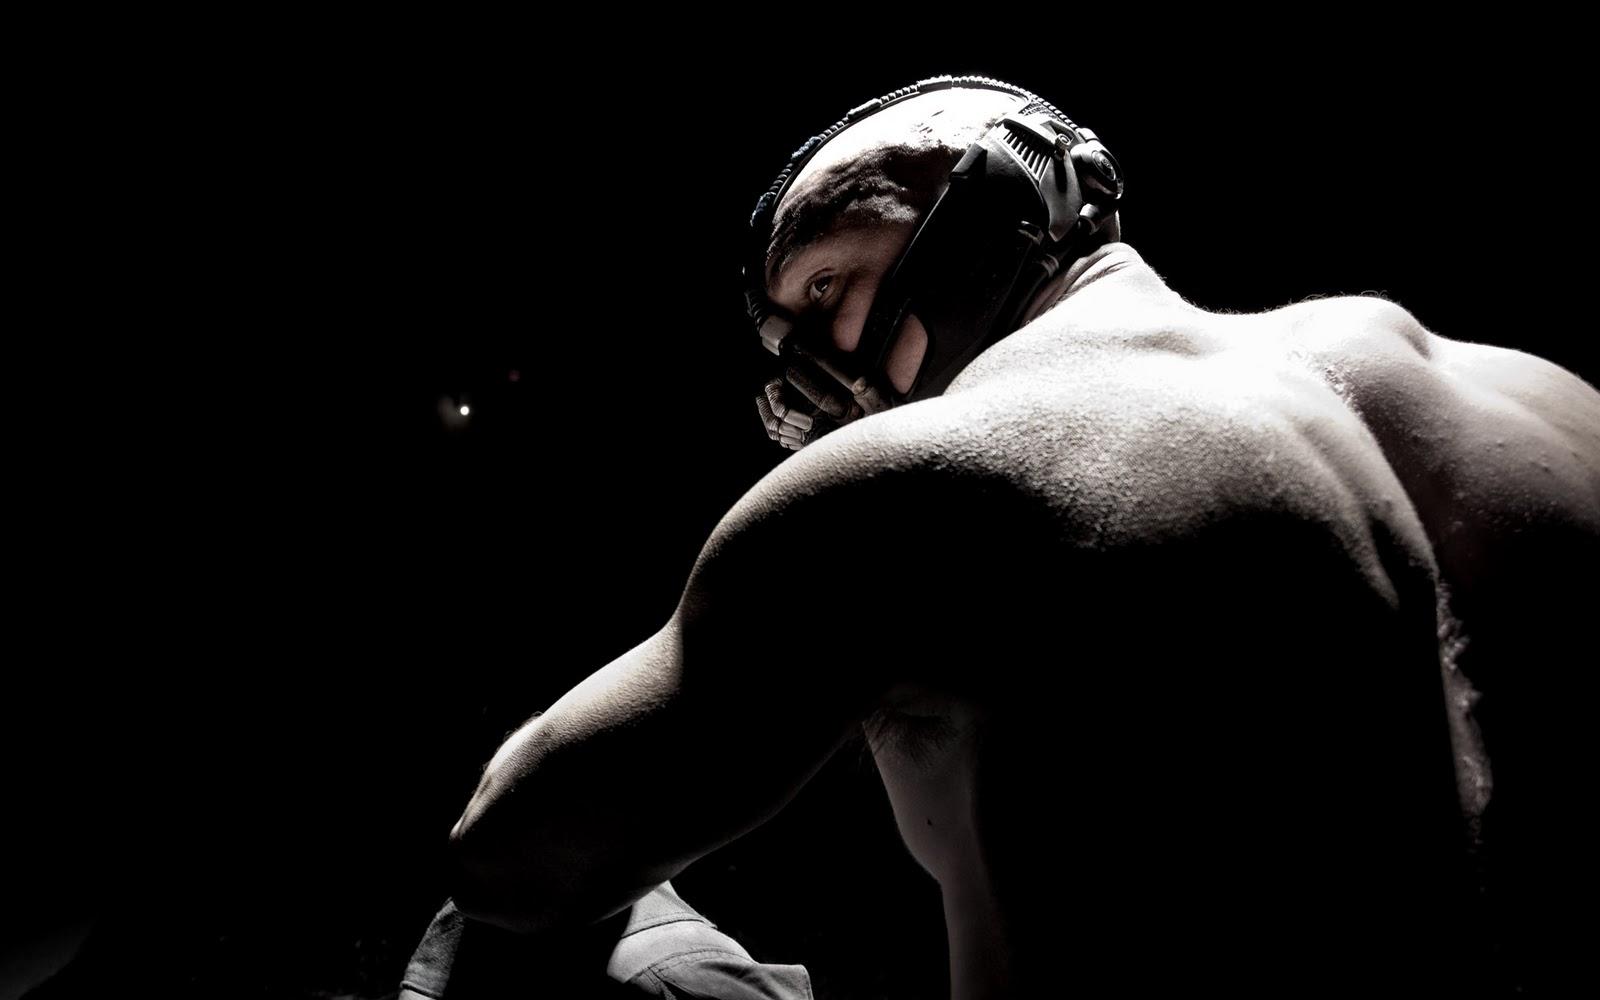 http://3.bp.blogspot.com/-RSC2Kfa-gsQ/T0QMbePkV8I/AAAAAAAACH0/X_0s8POEO7Y/s1600/dark-knight-rises-movie-image-tom-hardy-bane-hi-res-01.jpg